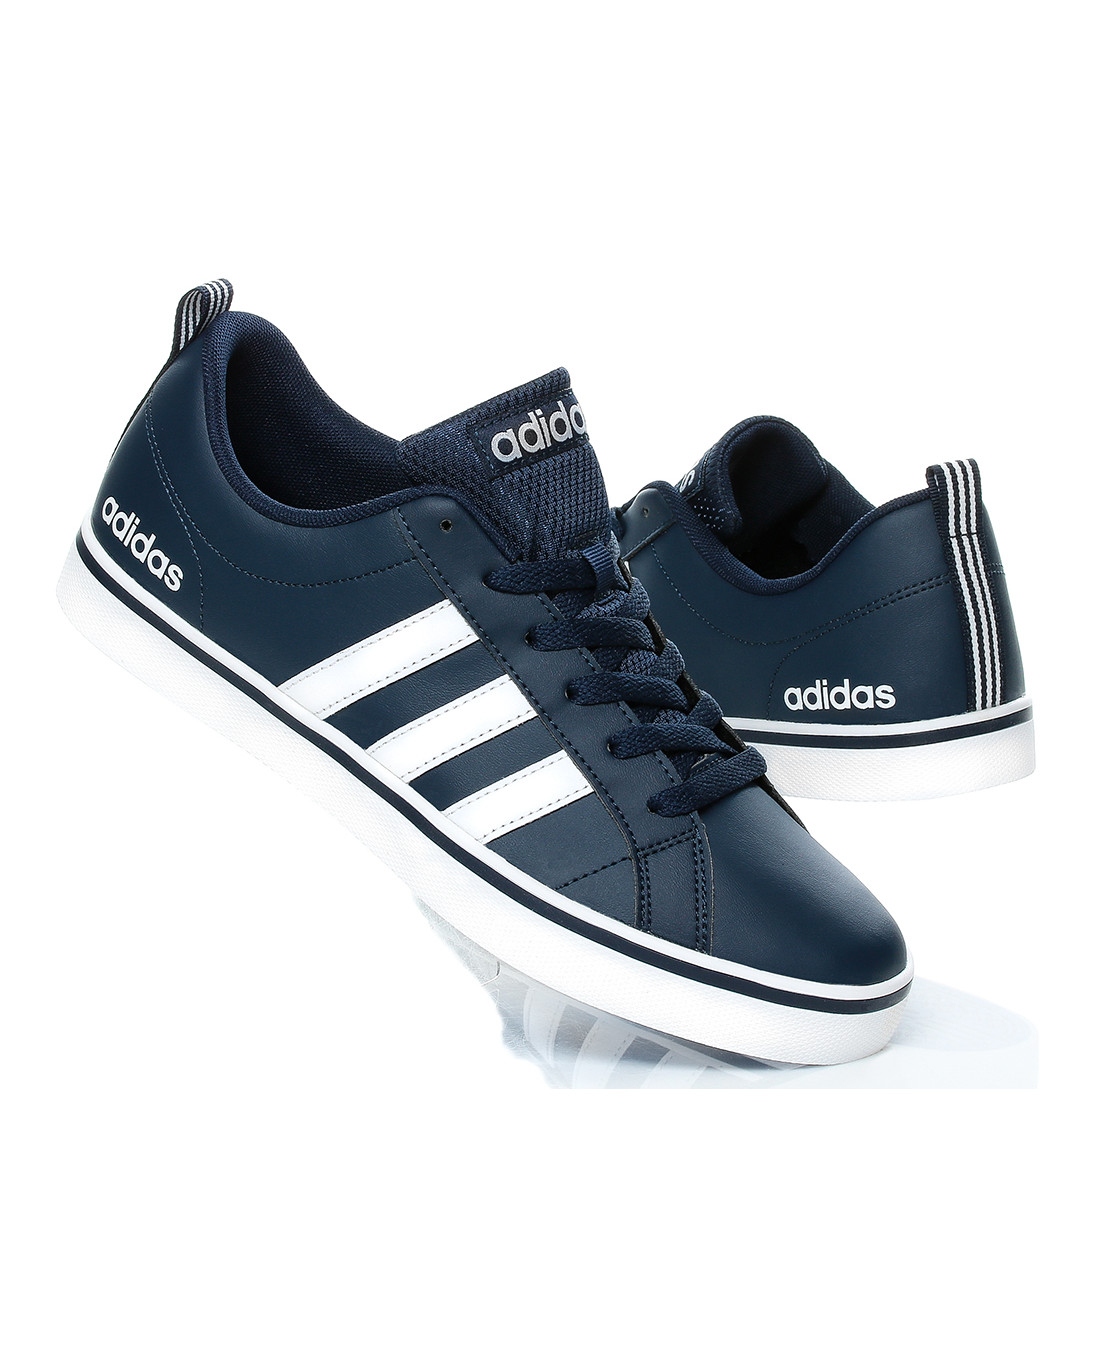 quality design dc919 ea8b9 Adidas Scarpe Sportive Sneakers VS Pace 2019 Blu Lifestyle Sportswear 9 9  di 10 ...